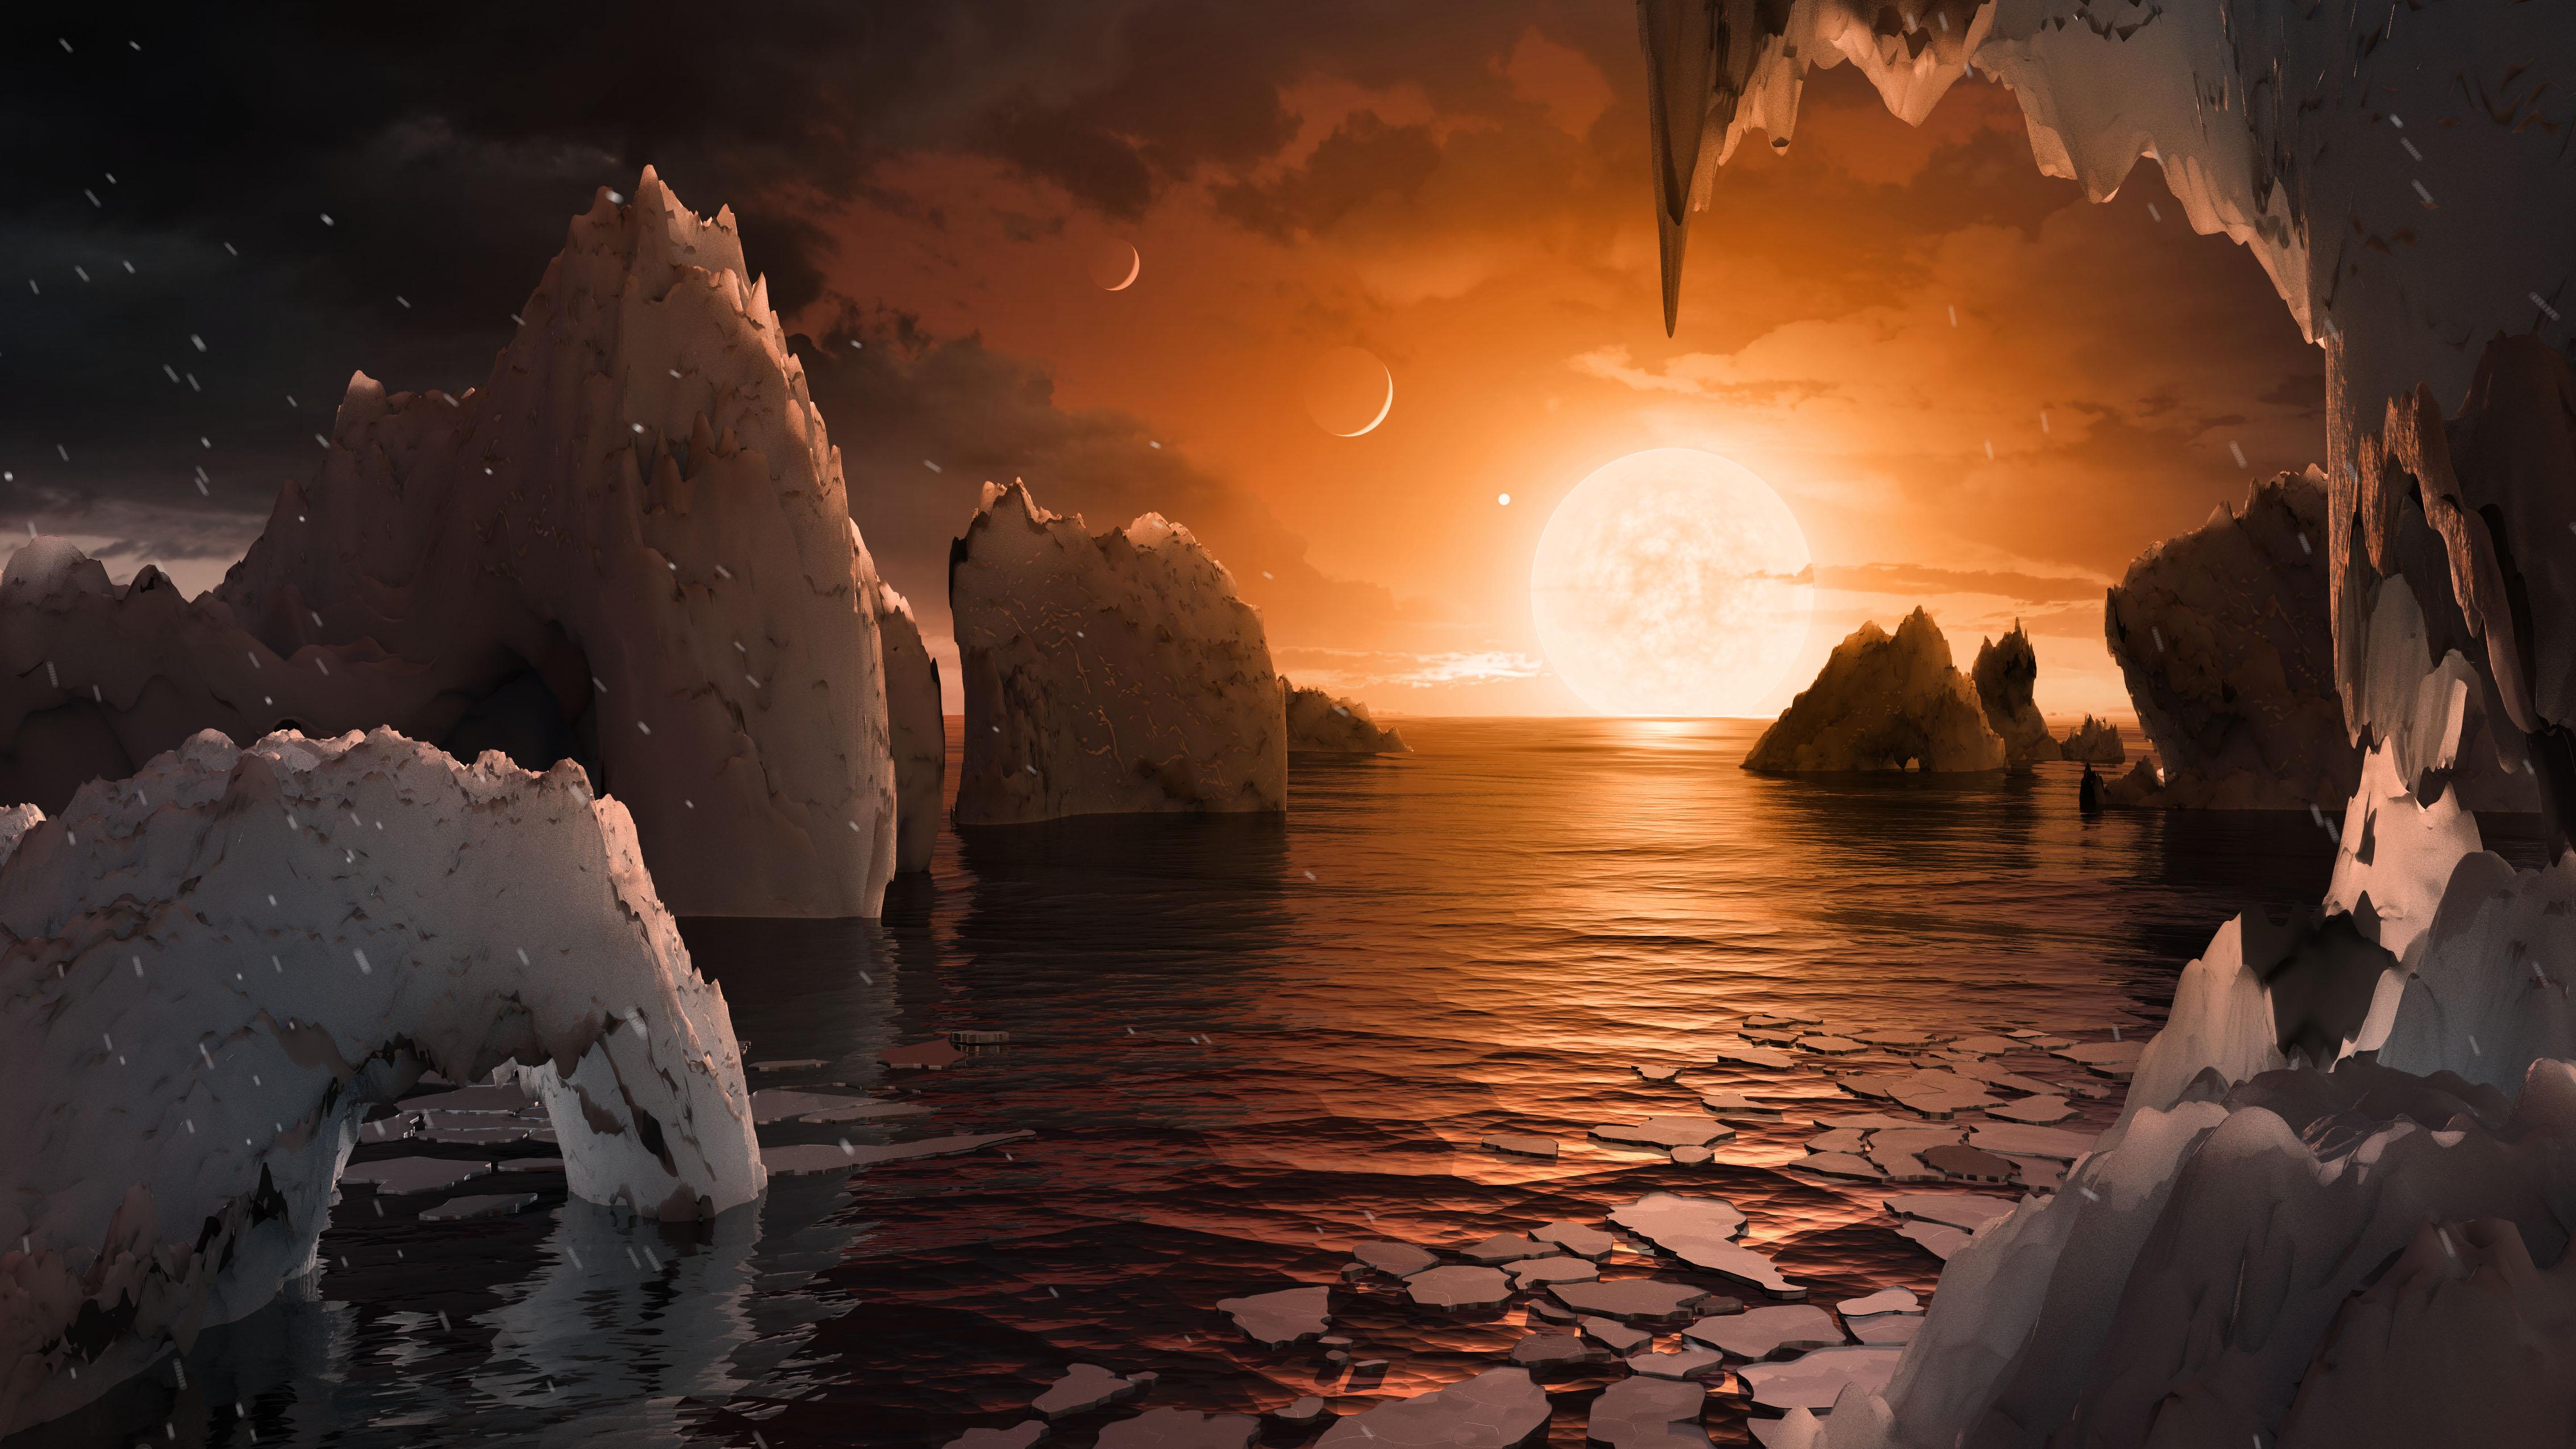 Bilddatei: Exo_Planet_TRAPPIST-1f_main_pia21423(C)NASA,JPL-Caltech.jpg